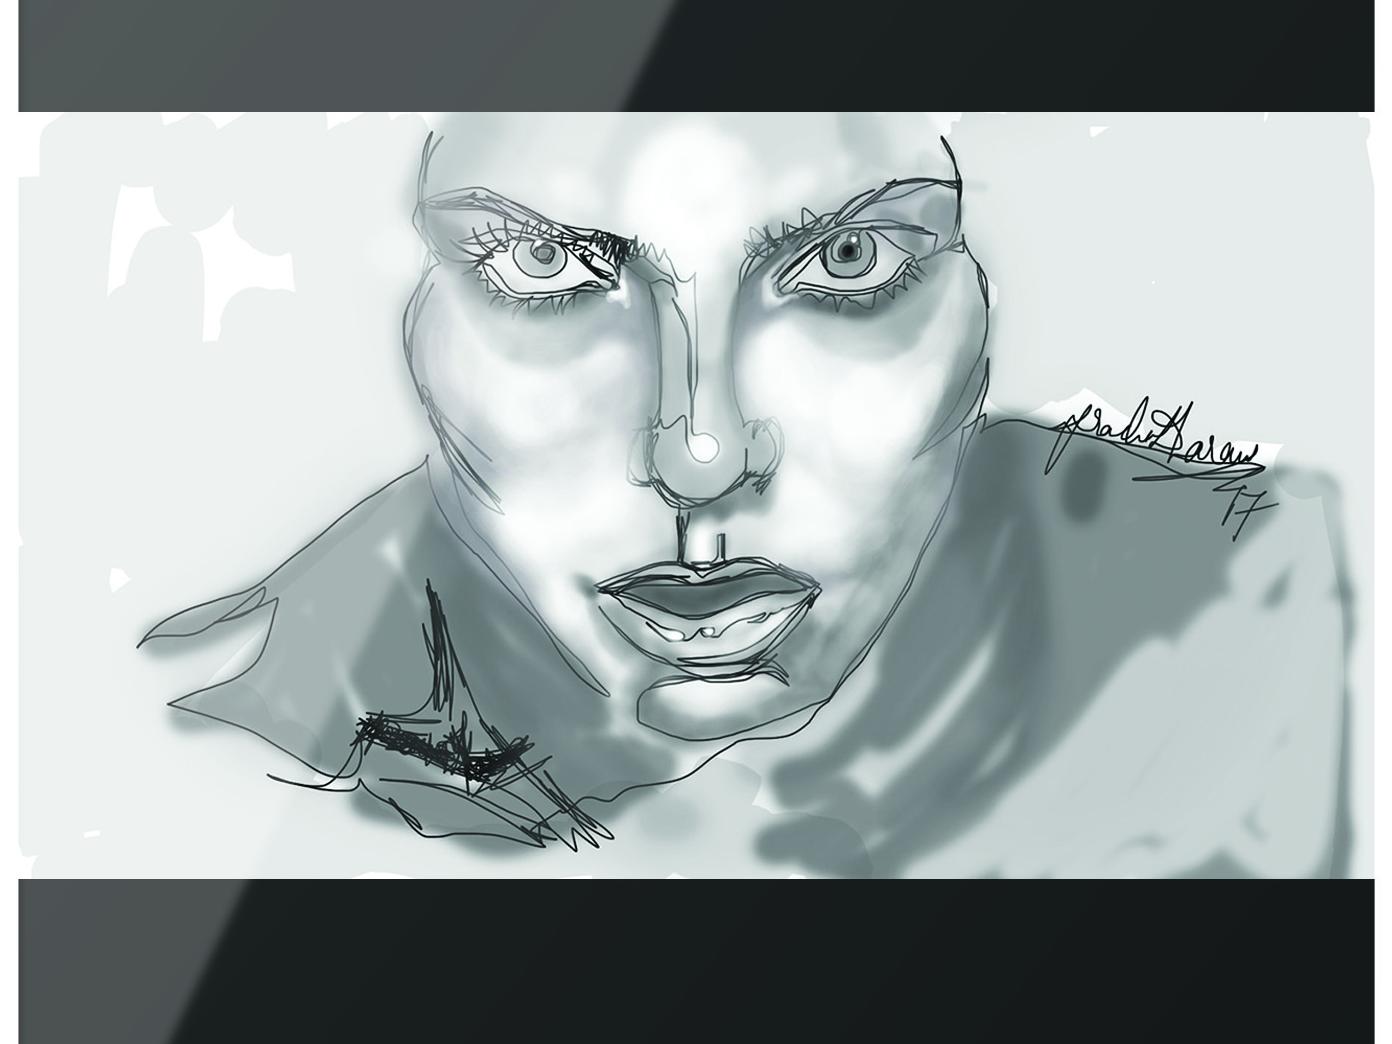 Blind line drawing. by Prachi Dharani | Dribbble | Dribbble